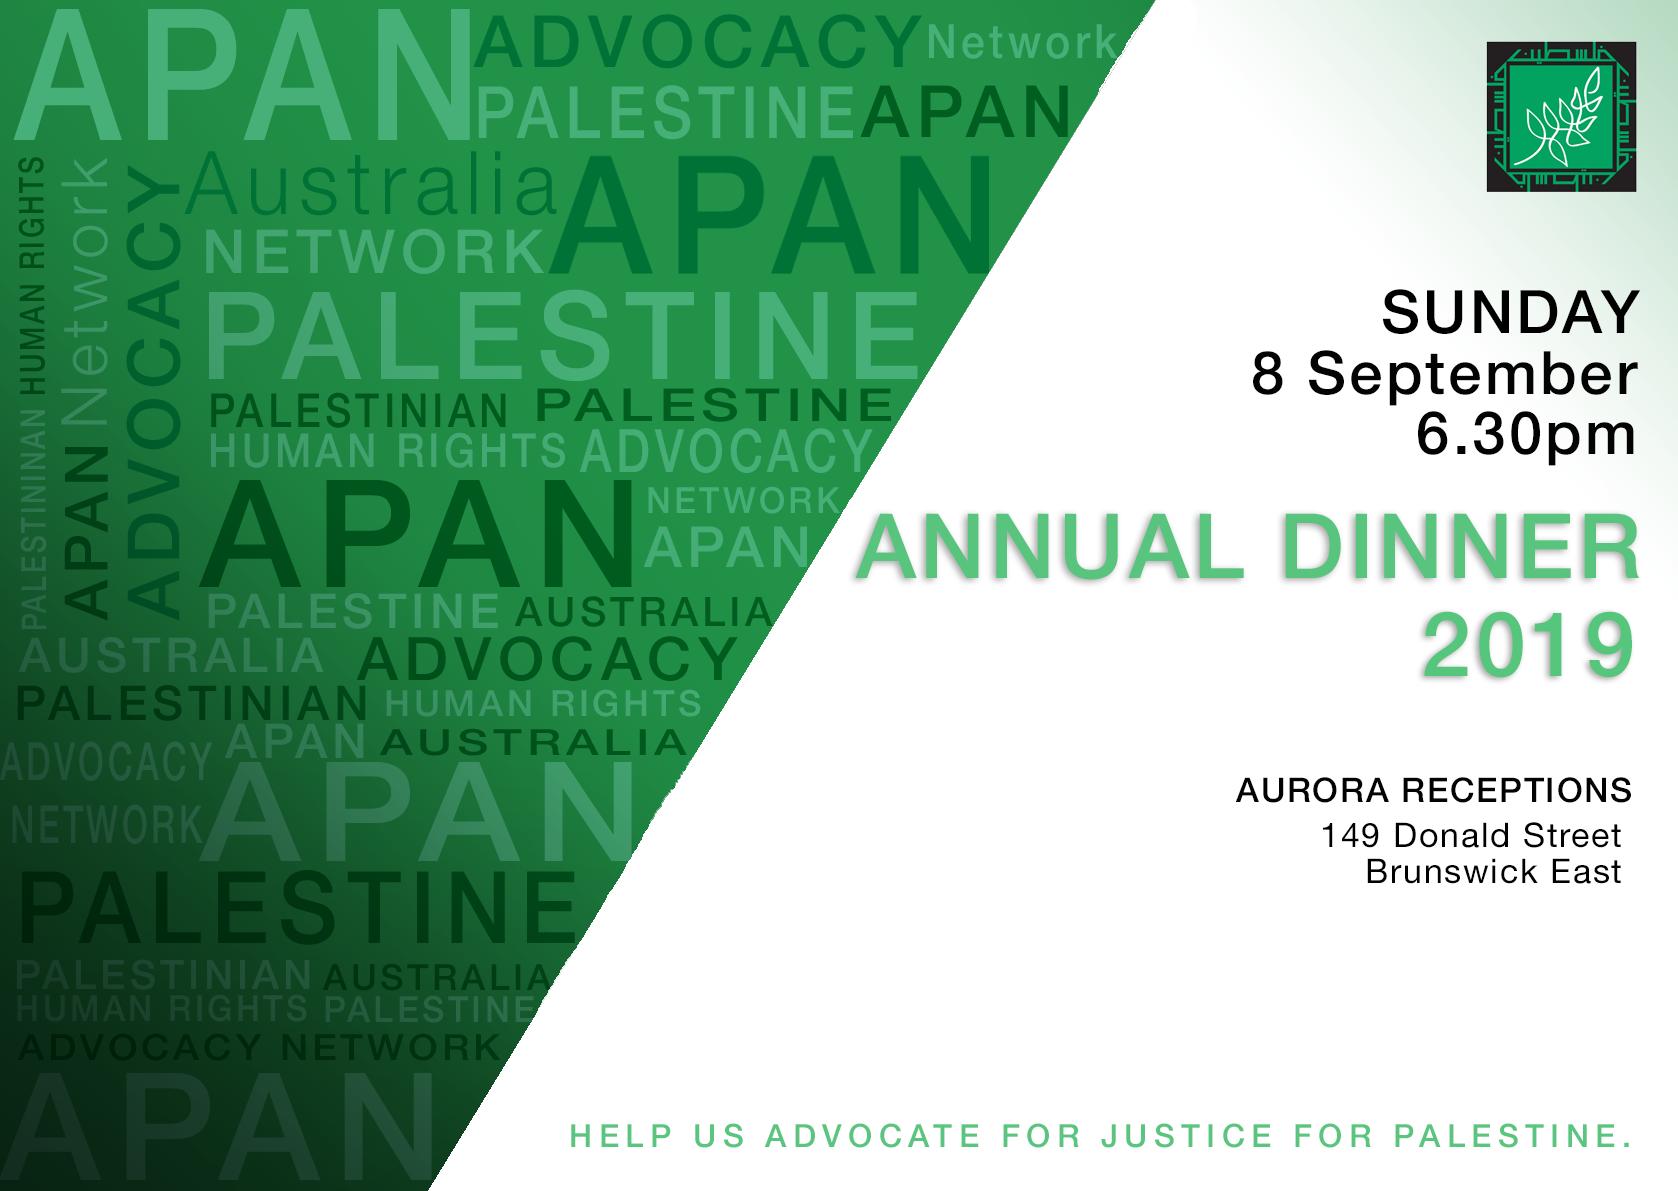 APAN | Australia Palestine Advocacy Network